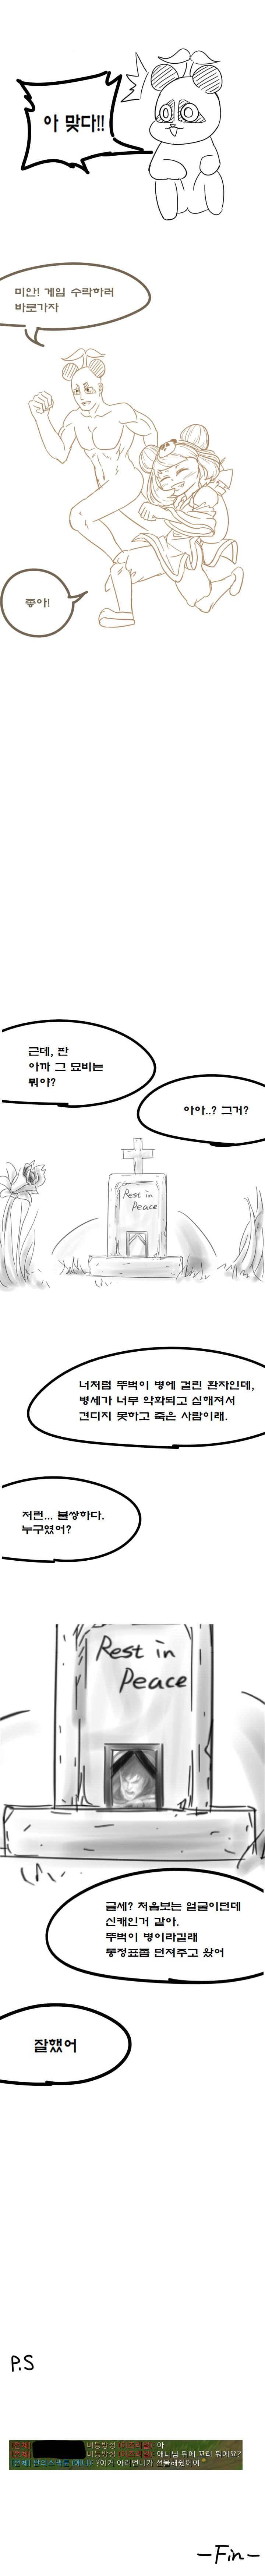 [LoL] 애니서폿만화 .manhwa | 인스티즈